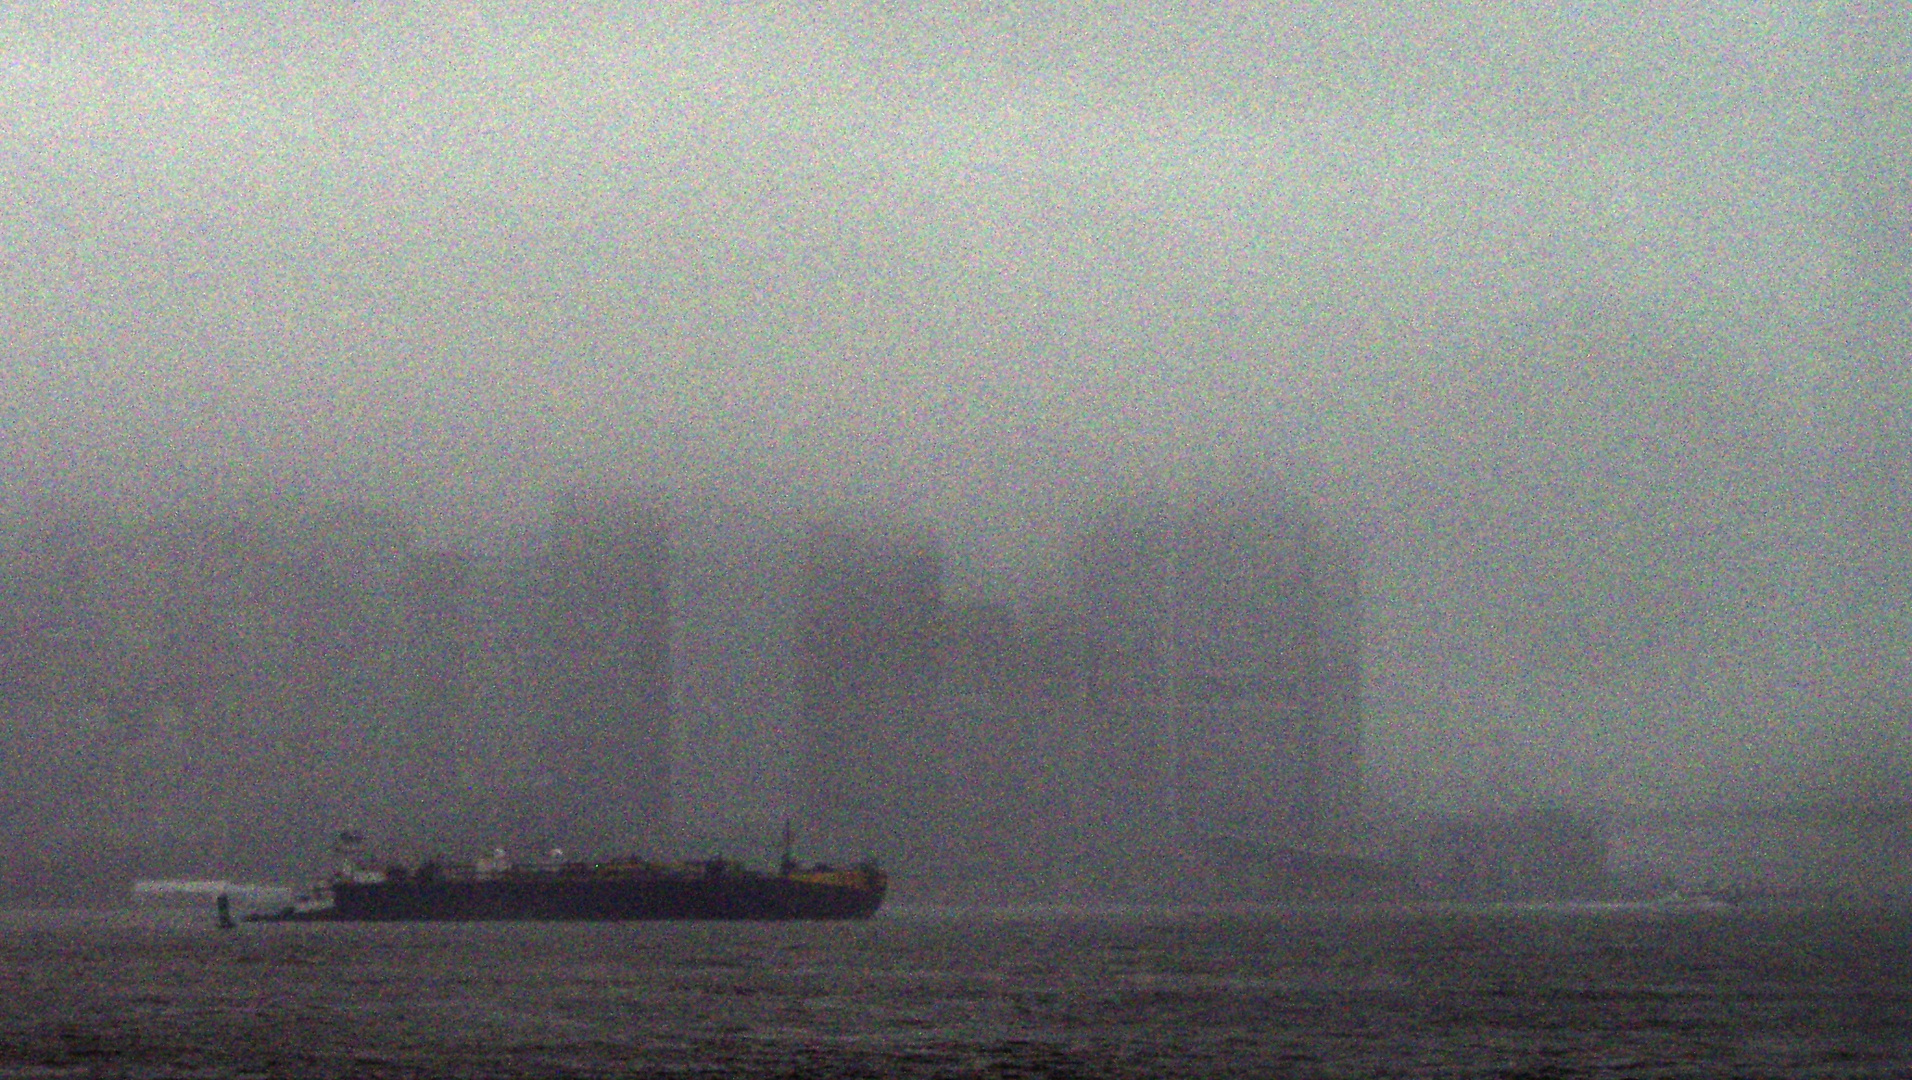 Lower Manhattan in the rain